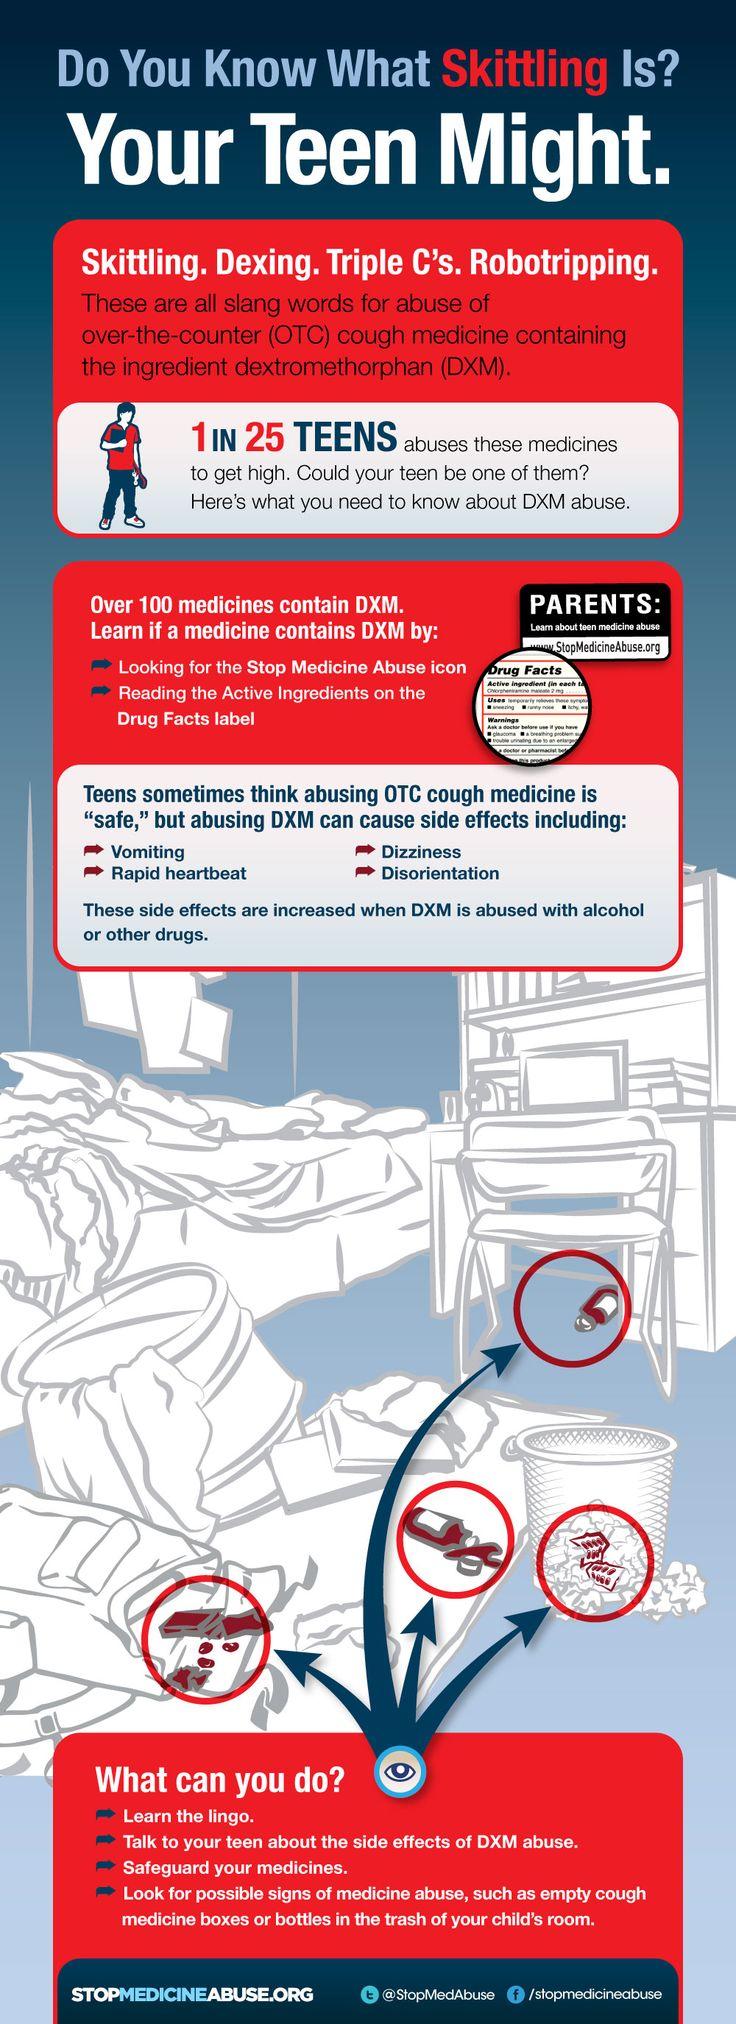 Teen Drug Abuse: Cough Medicine and DXM